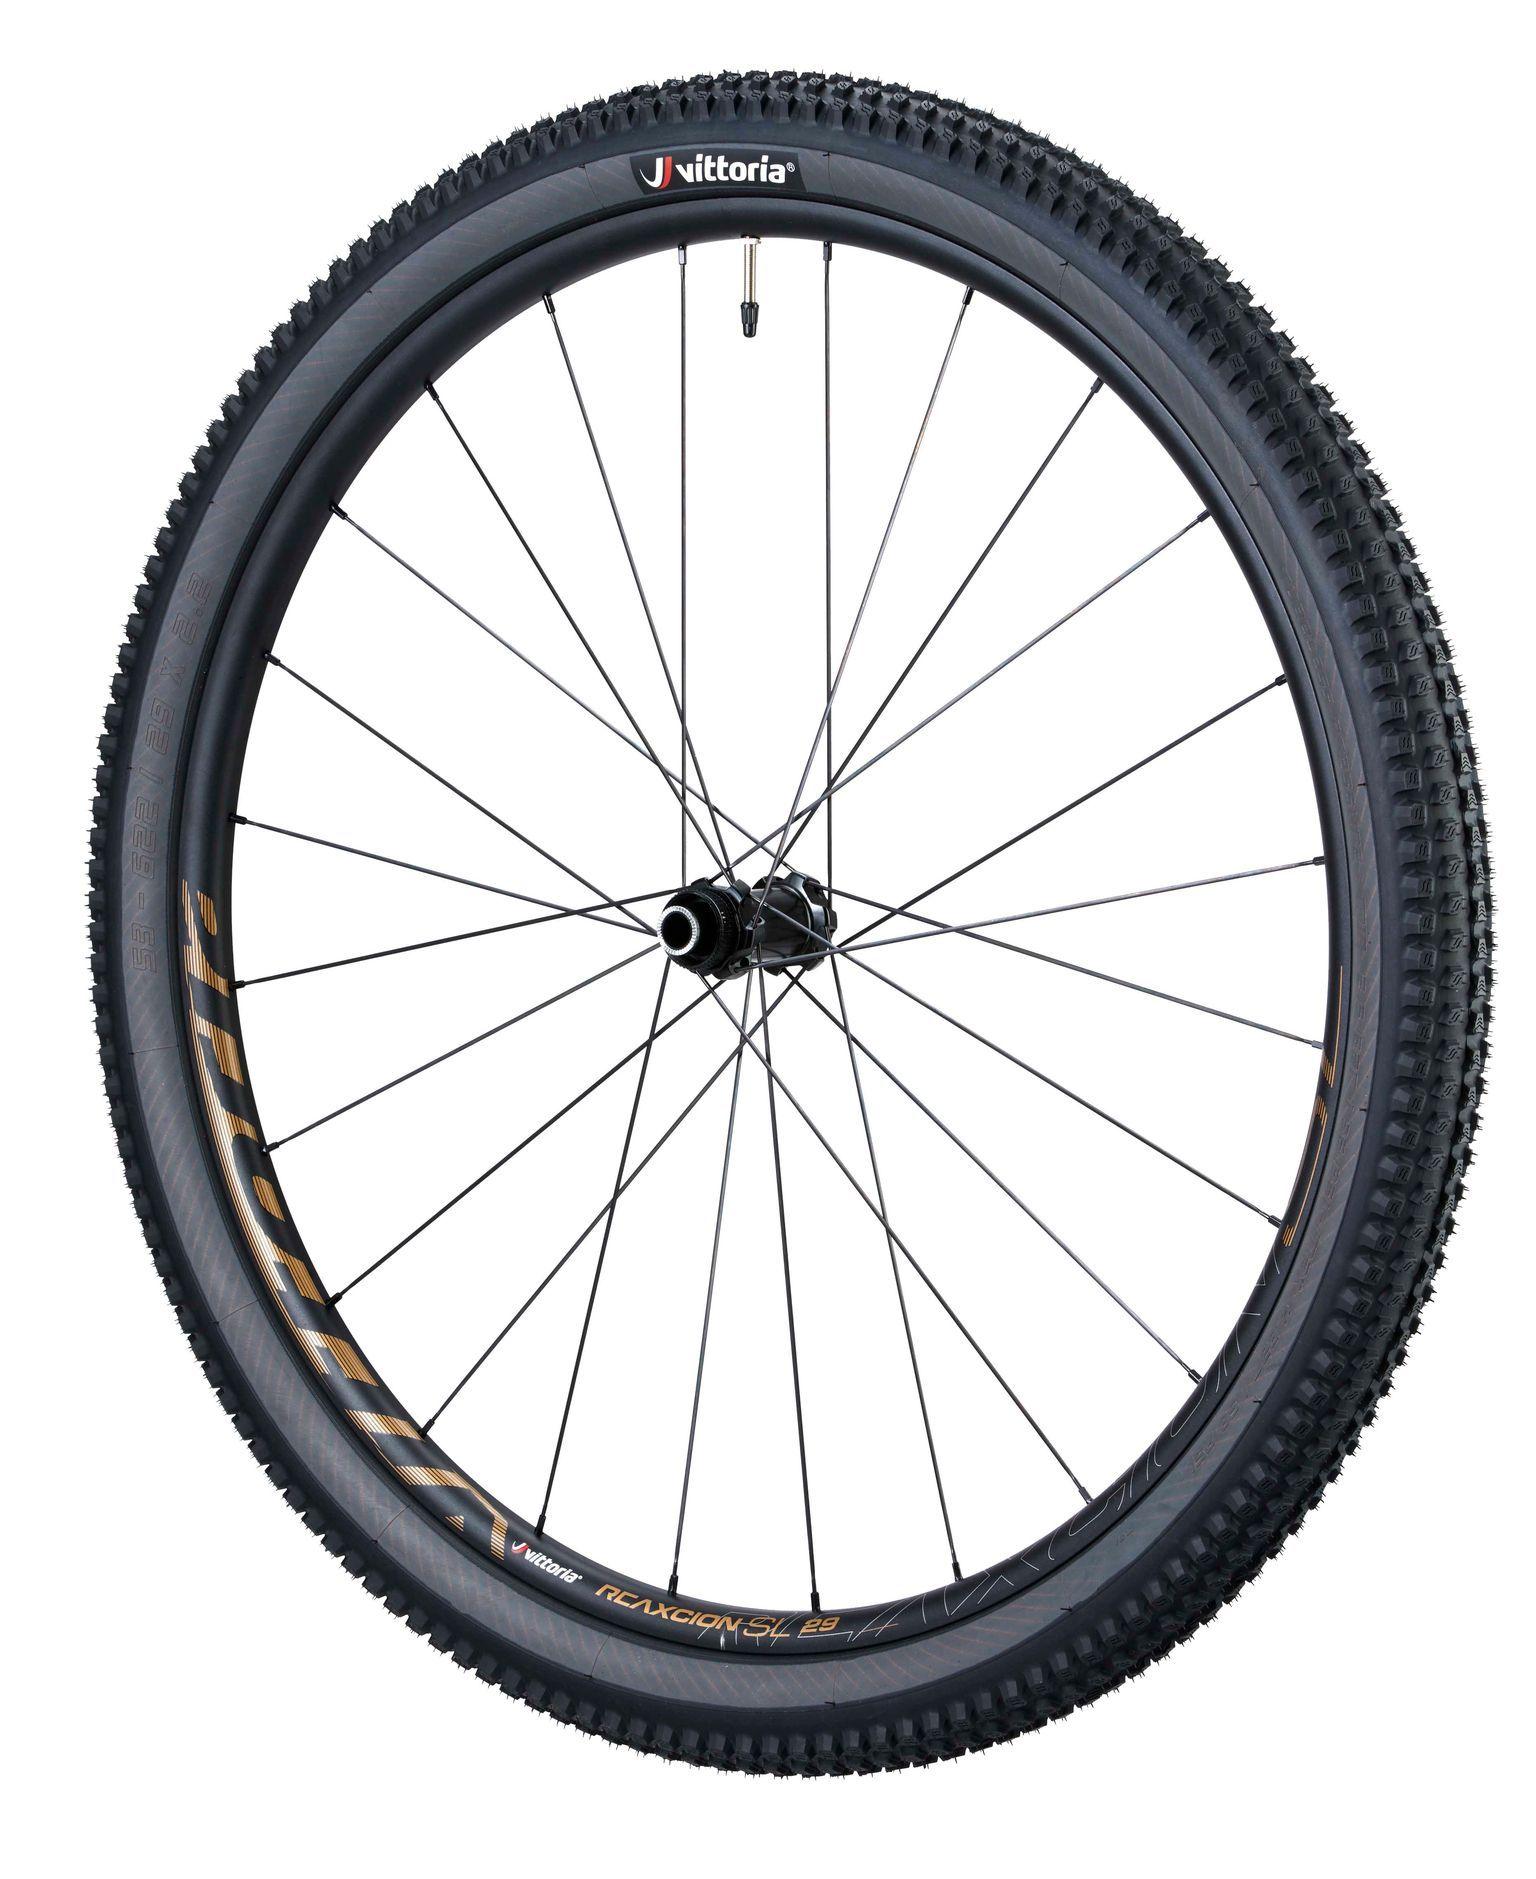 Vittoria Gato II G+ TNT 27.5 x 2.2 Cross Country MTB Tire Tubeless Folding 760g